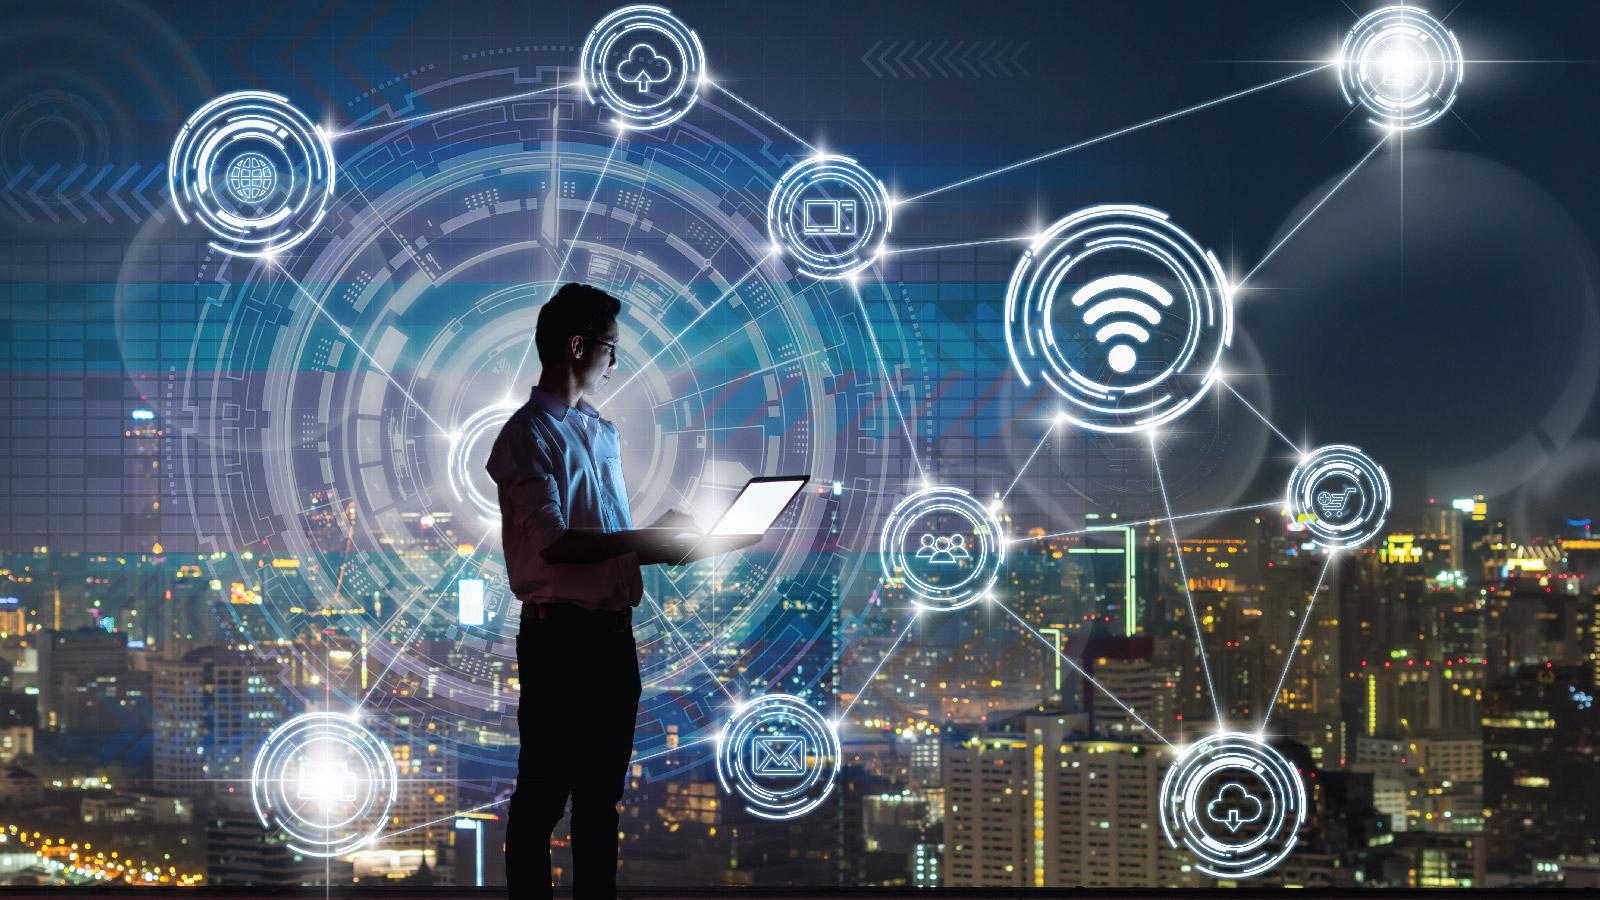 Music Trends 2020.4 Iot Trends That Will Rule In 2020 Enterprisetalk